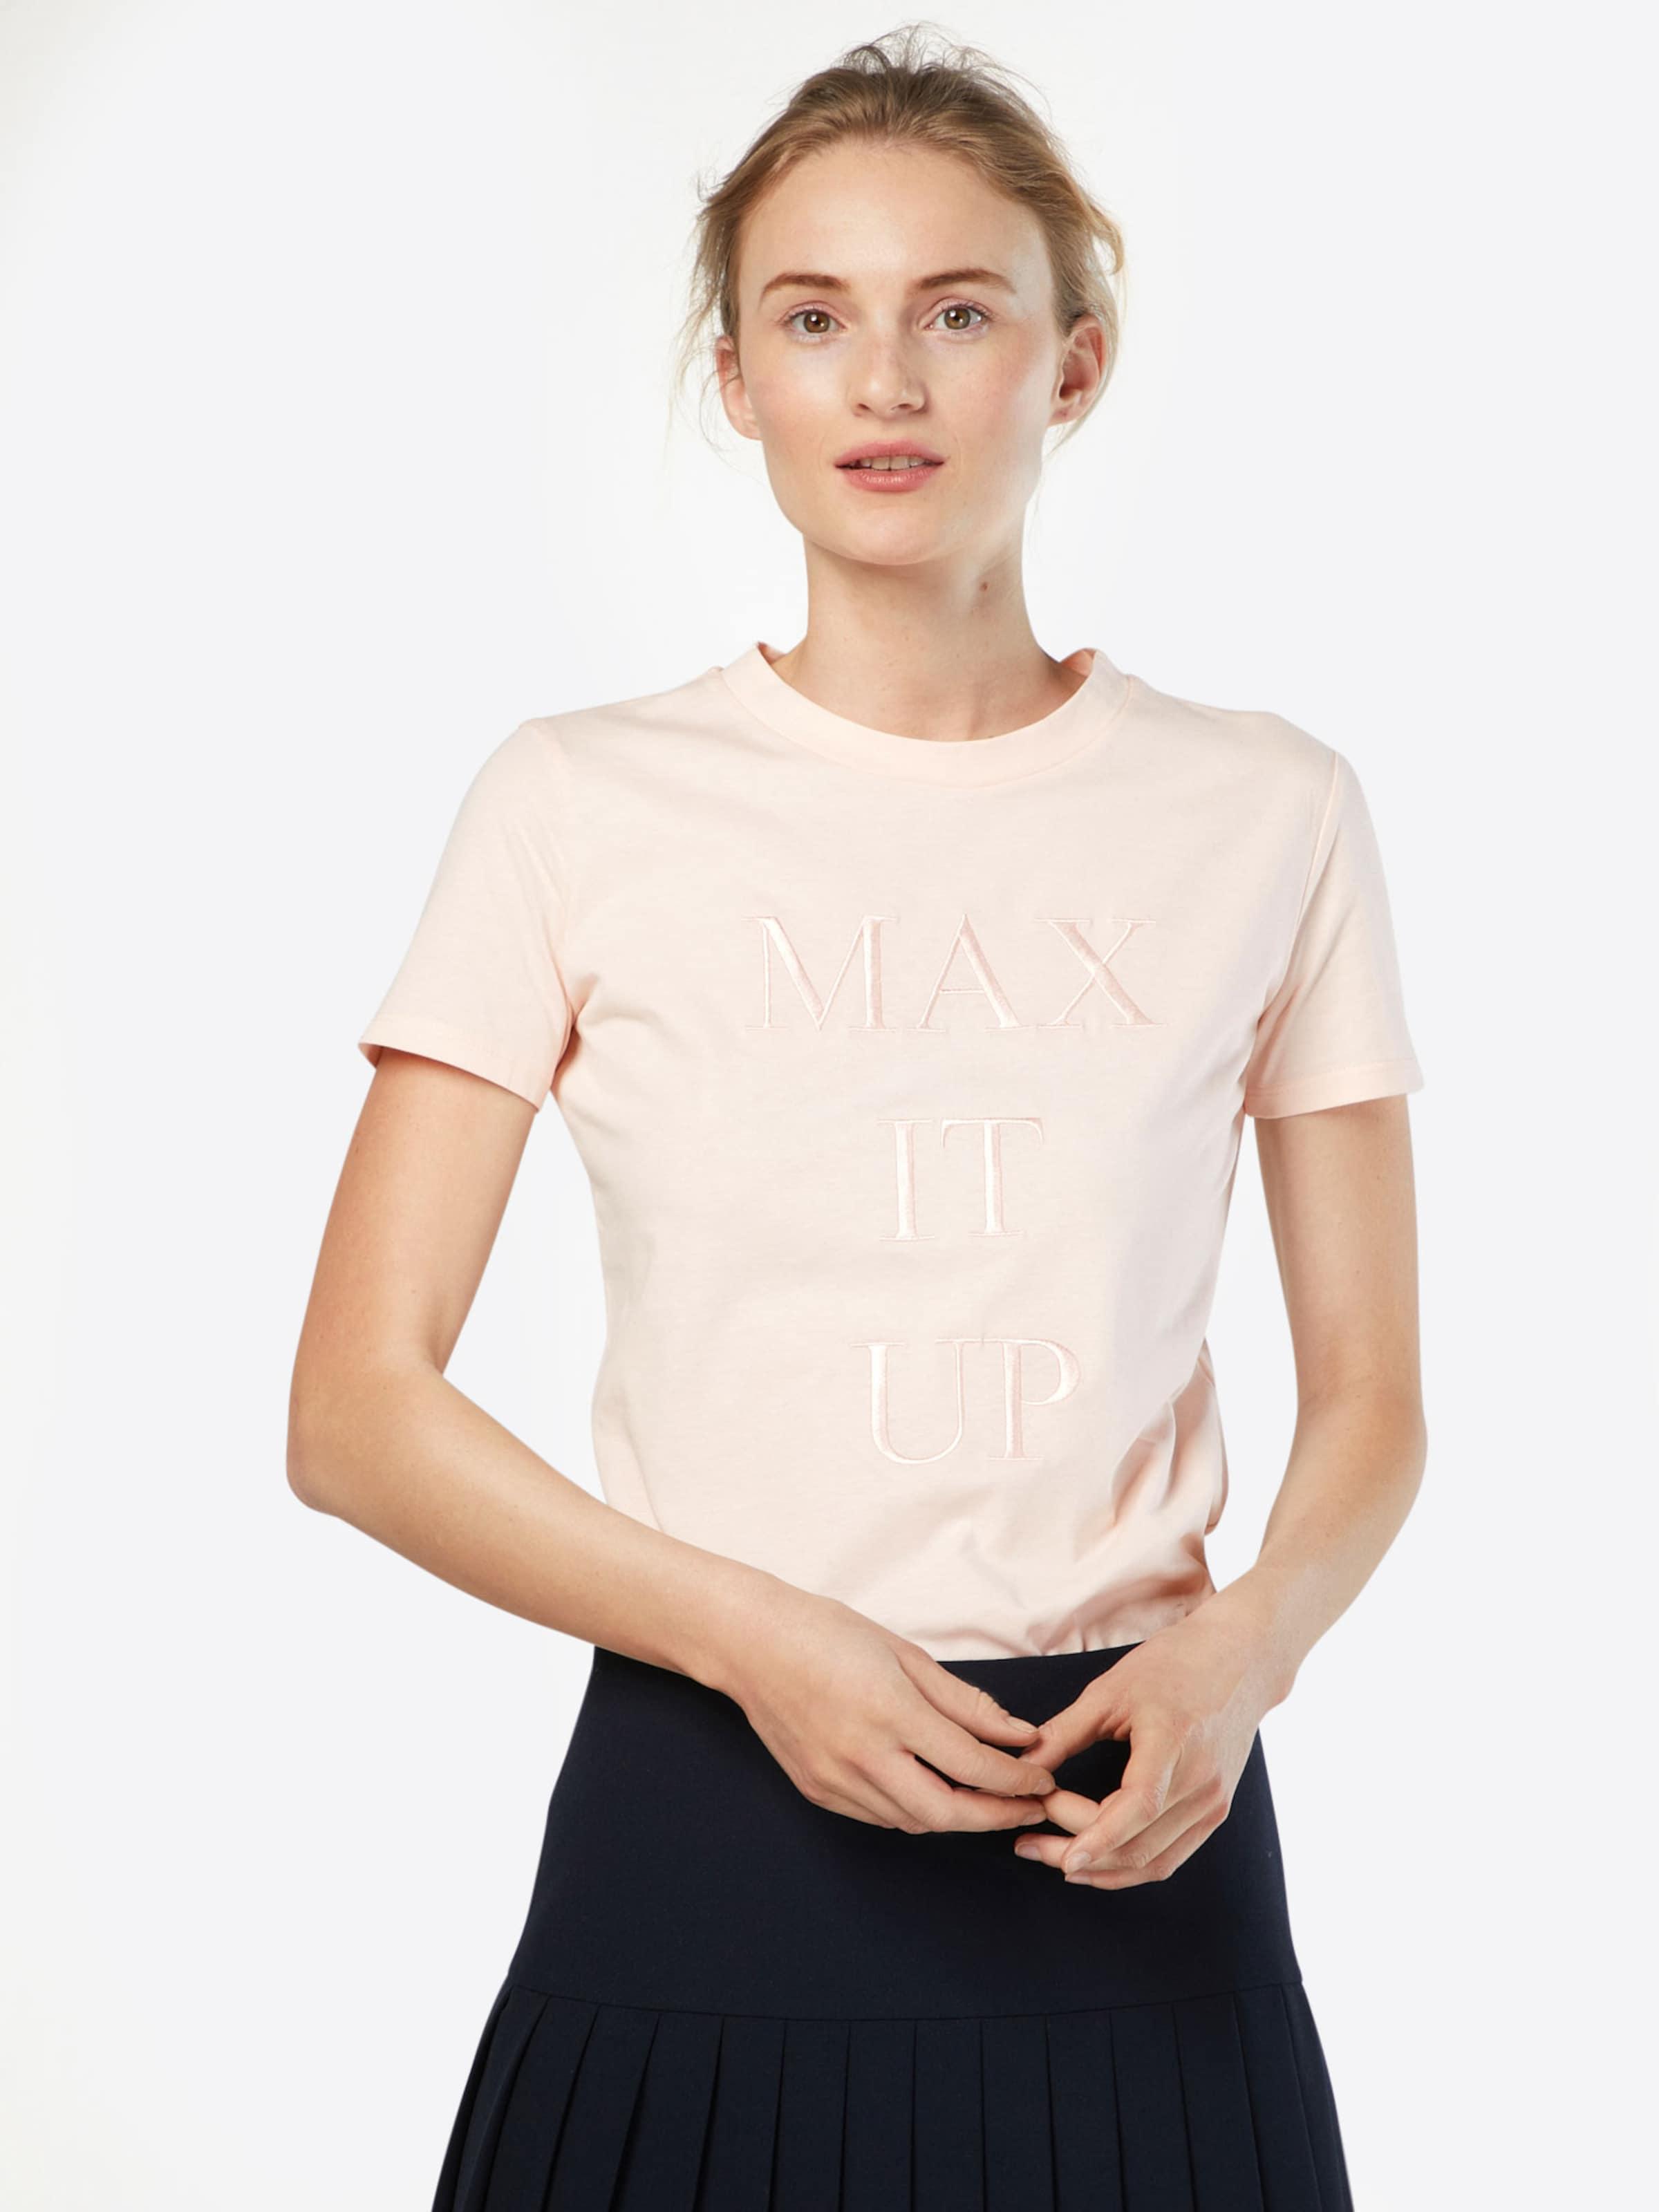 MAX shirt T MAX amp;Co 'DORALICE' T amp;Co 'DORALICE' shirt wznqg1I